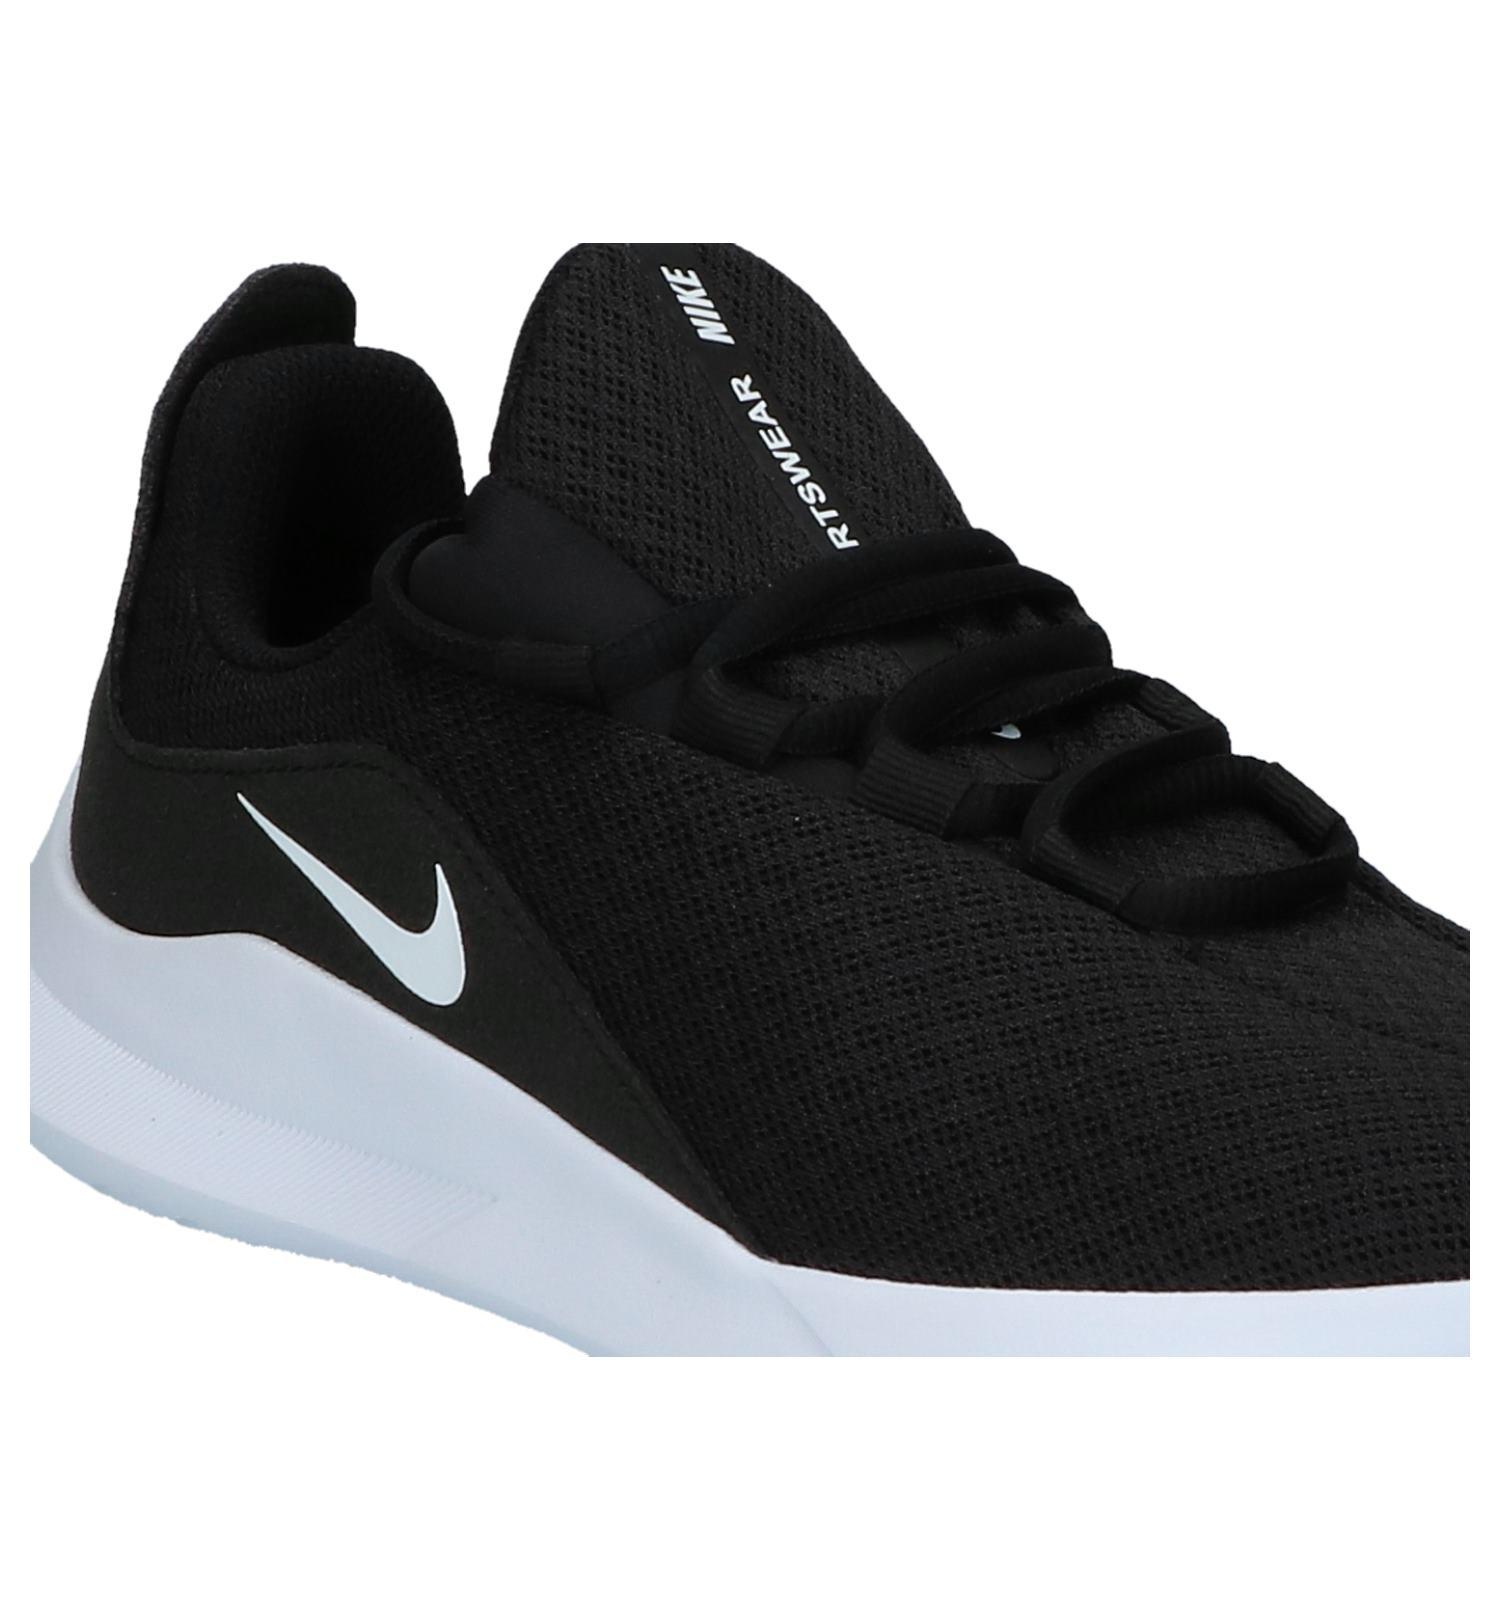 35e53a8f1cf Zwarte Slip-on Sneakers Nike Viale | TORFS.BE | Gratis verzend en retour